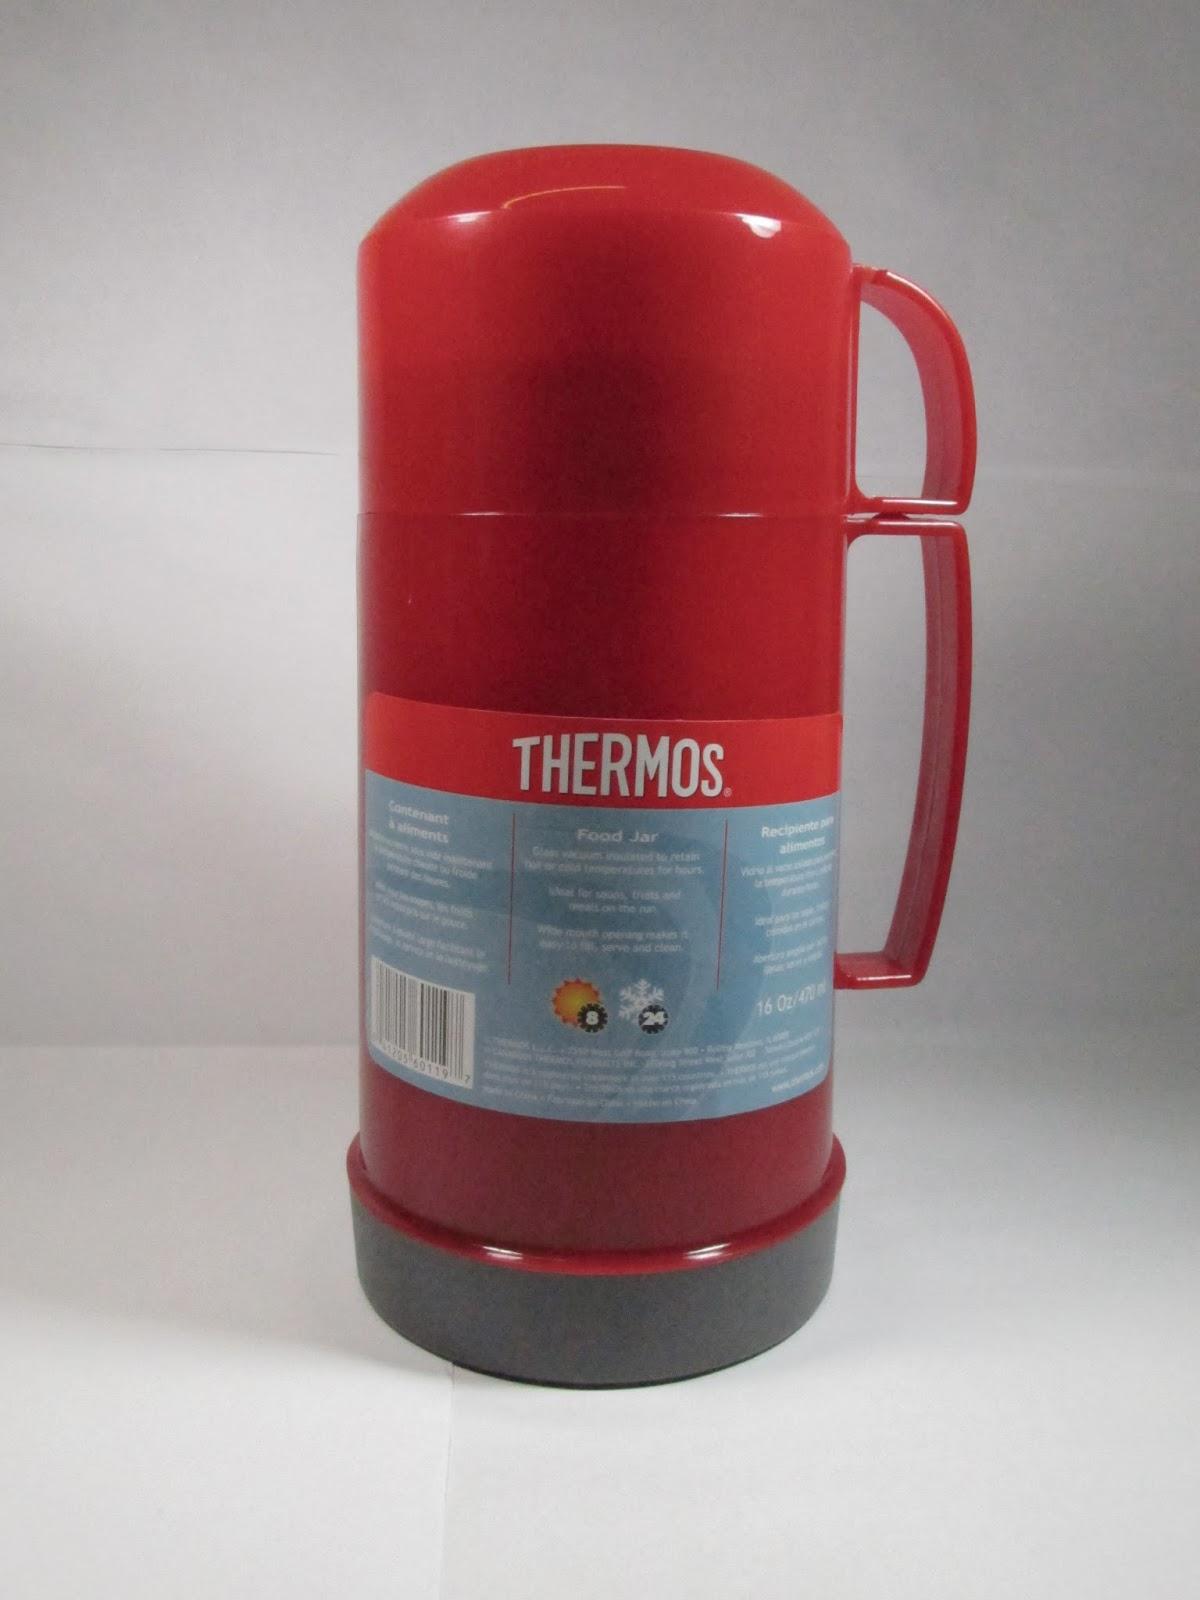 Vacuum Insulated 16 Oz 470ml Red Food Jar Hdj Online Store